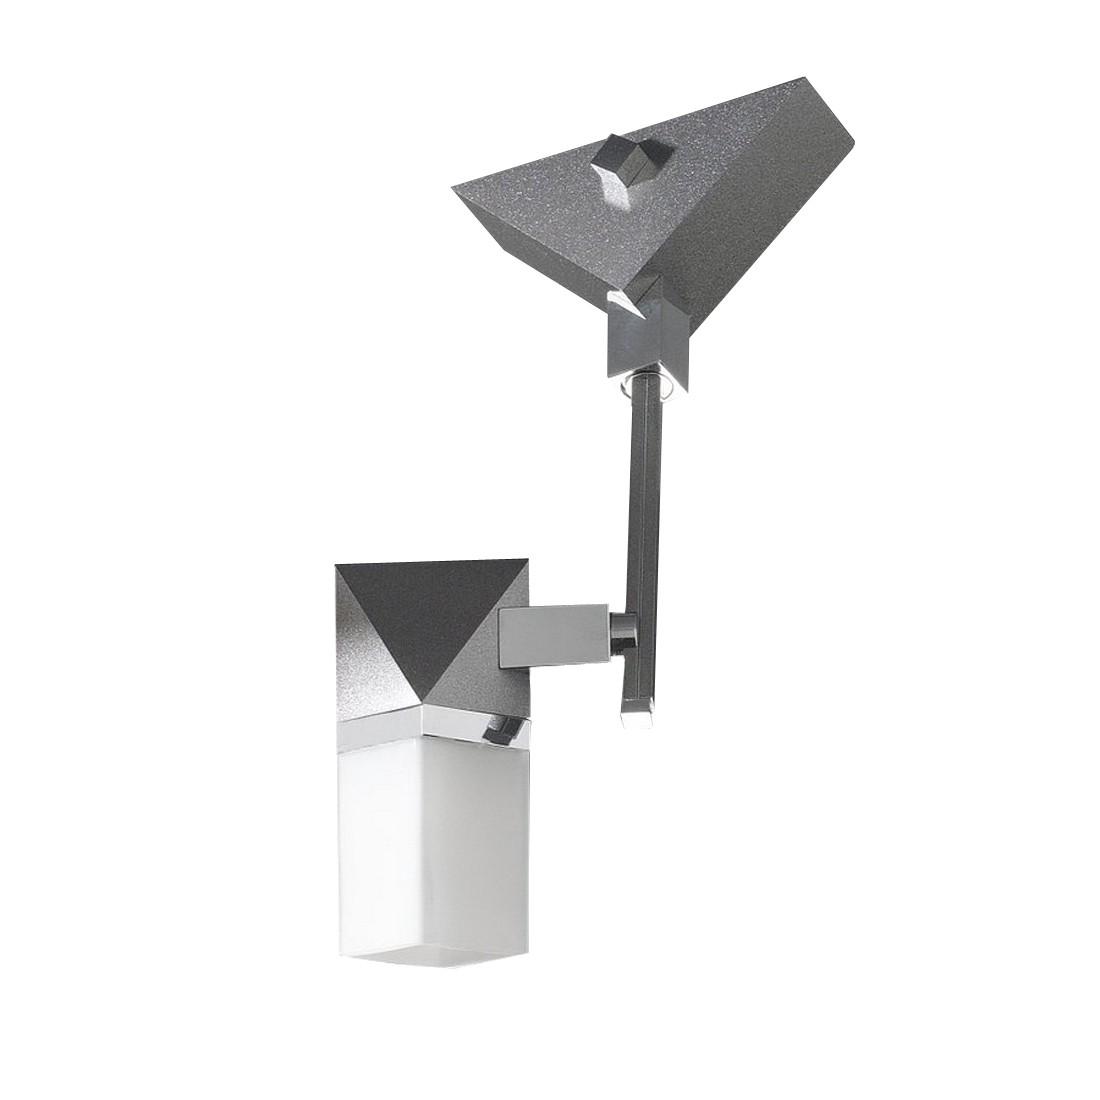 Decken--Wandleuchte Alutop G1 - 1-flammig - Terra-Metalica-Chrom, In-Nova Design